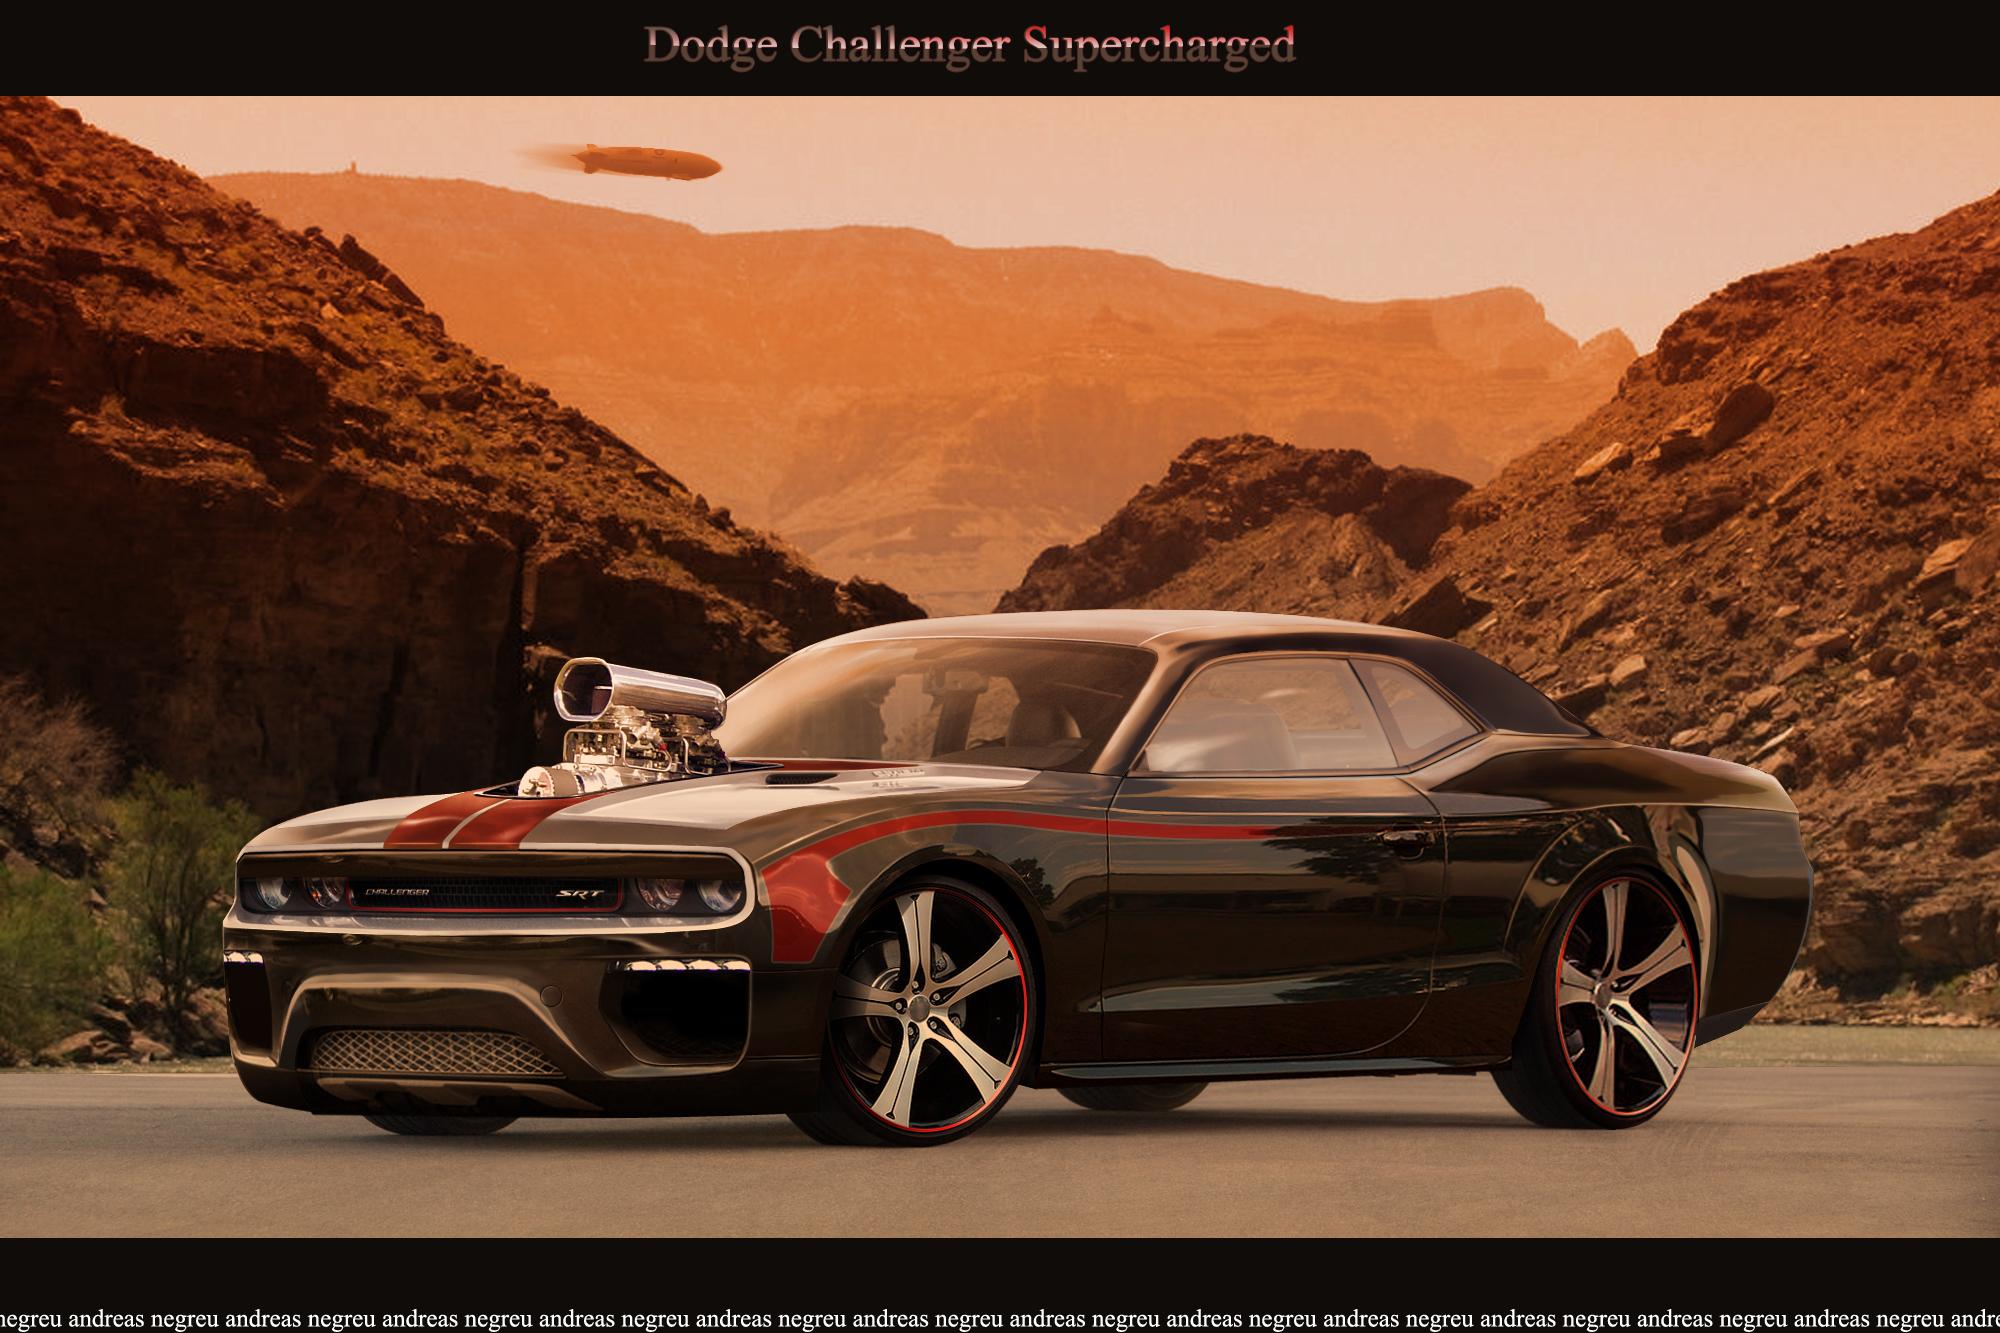 concept car wallpapers hd xpx desktop hd cars wallpapers desktop 2000x1333